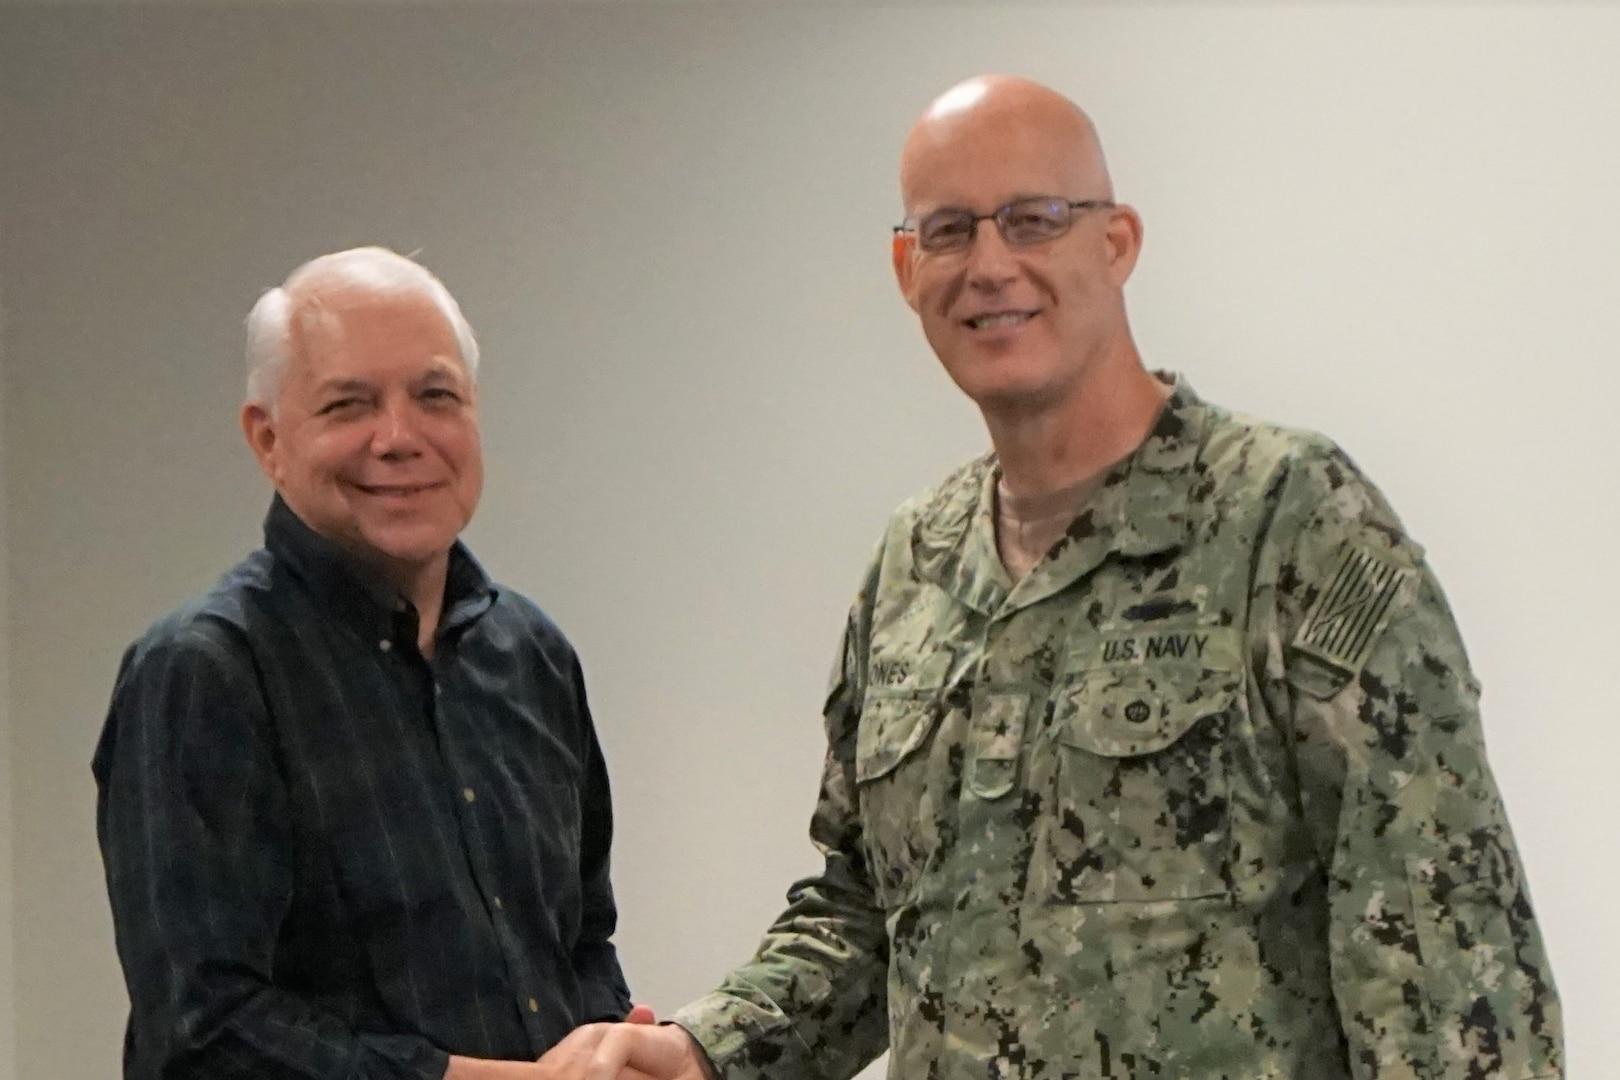 Distribution San Joaquin's Maldonado retires after 51 years of combined service